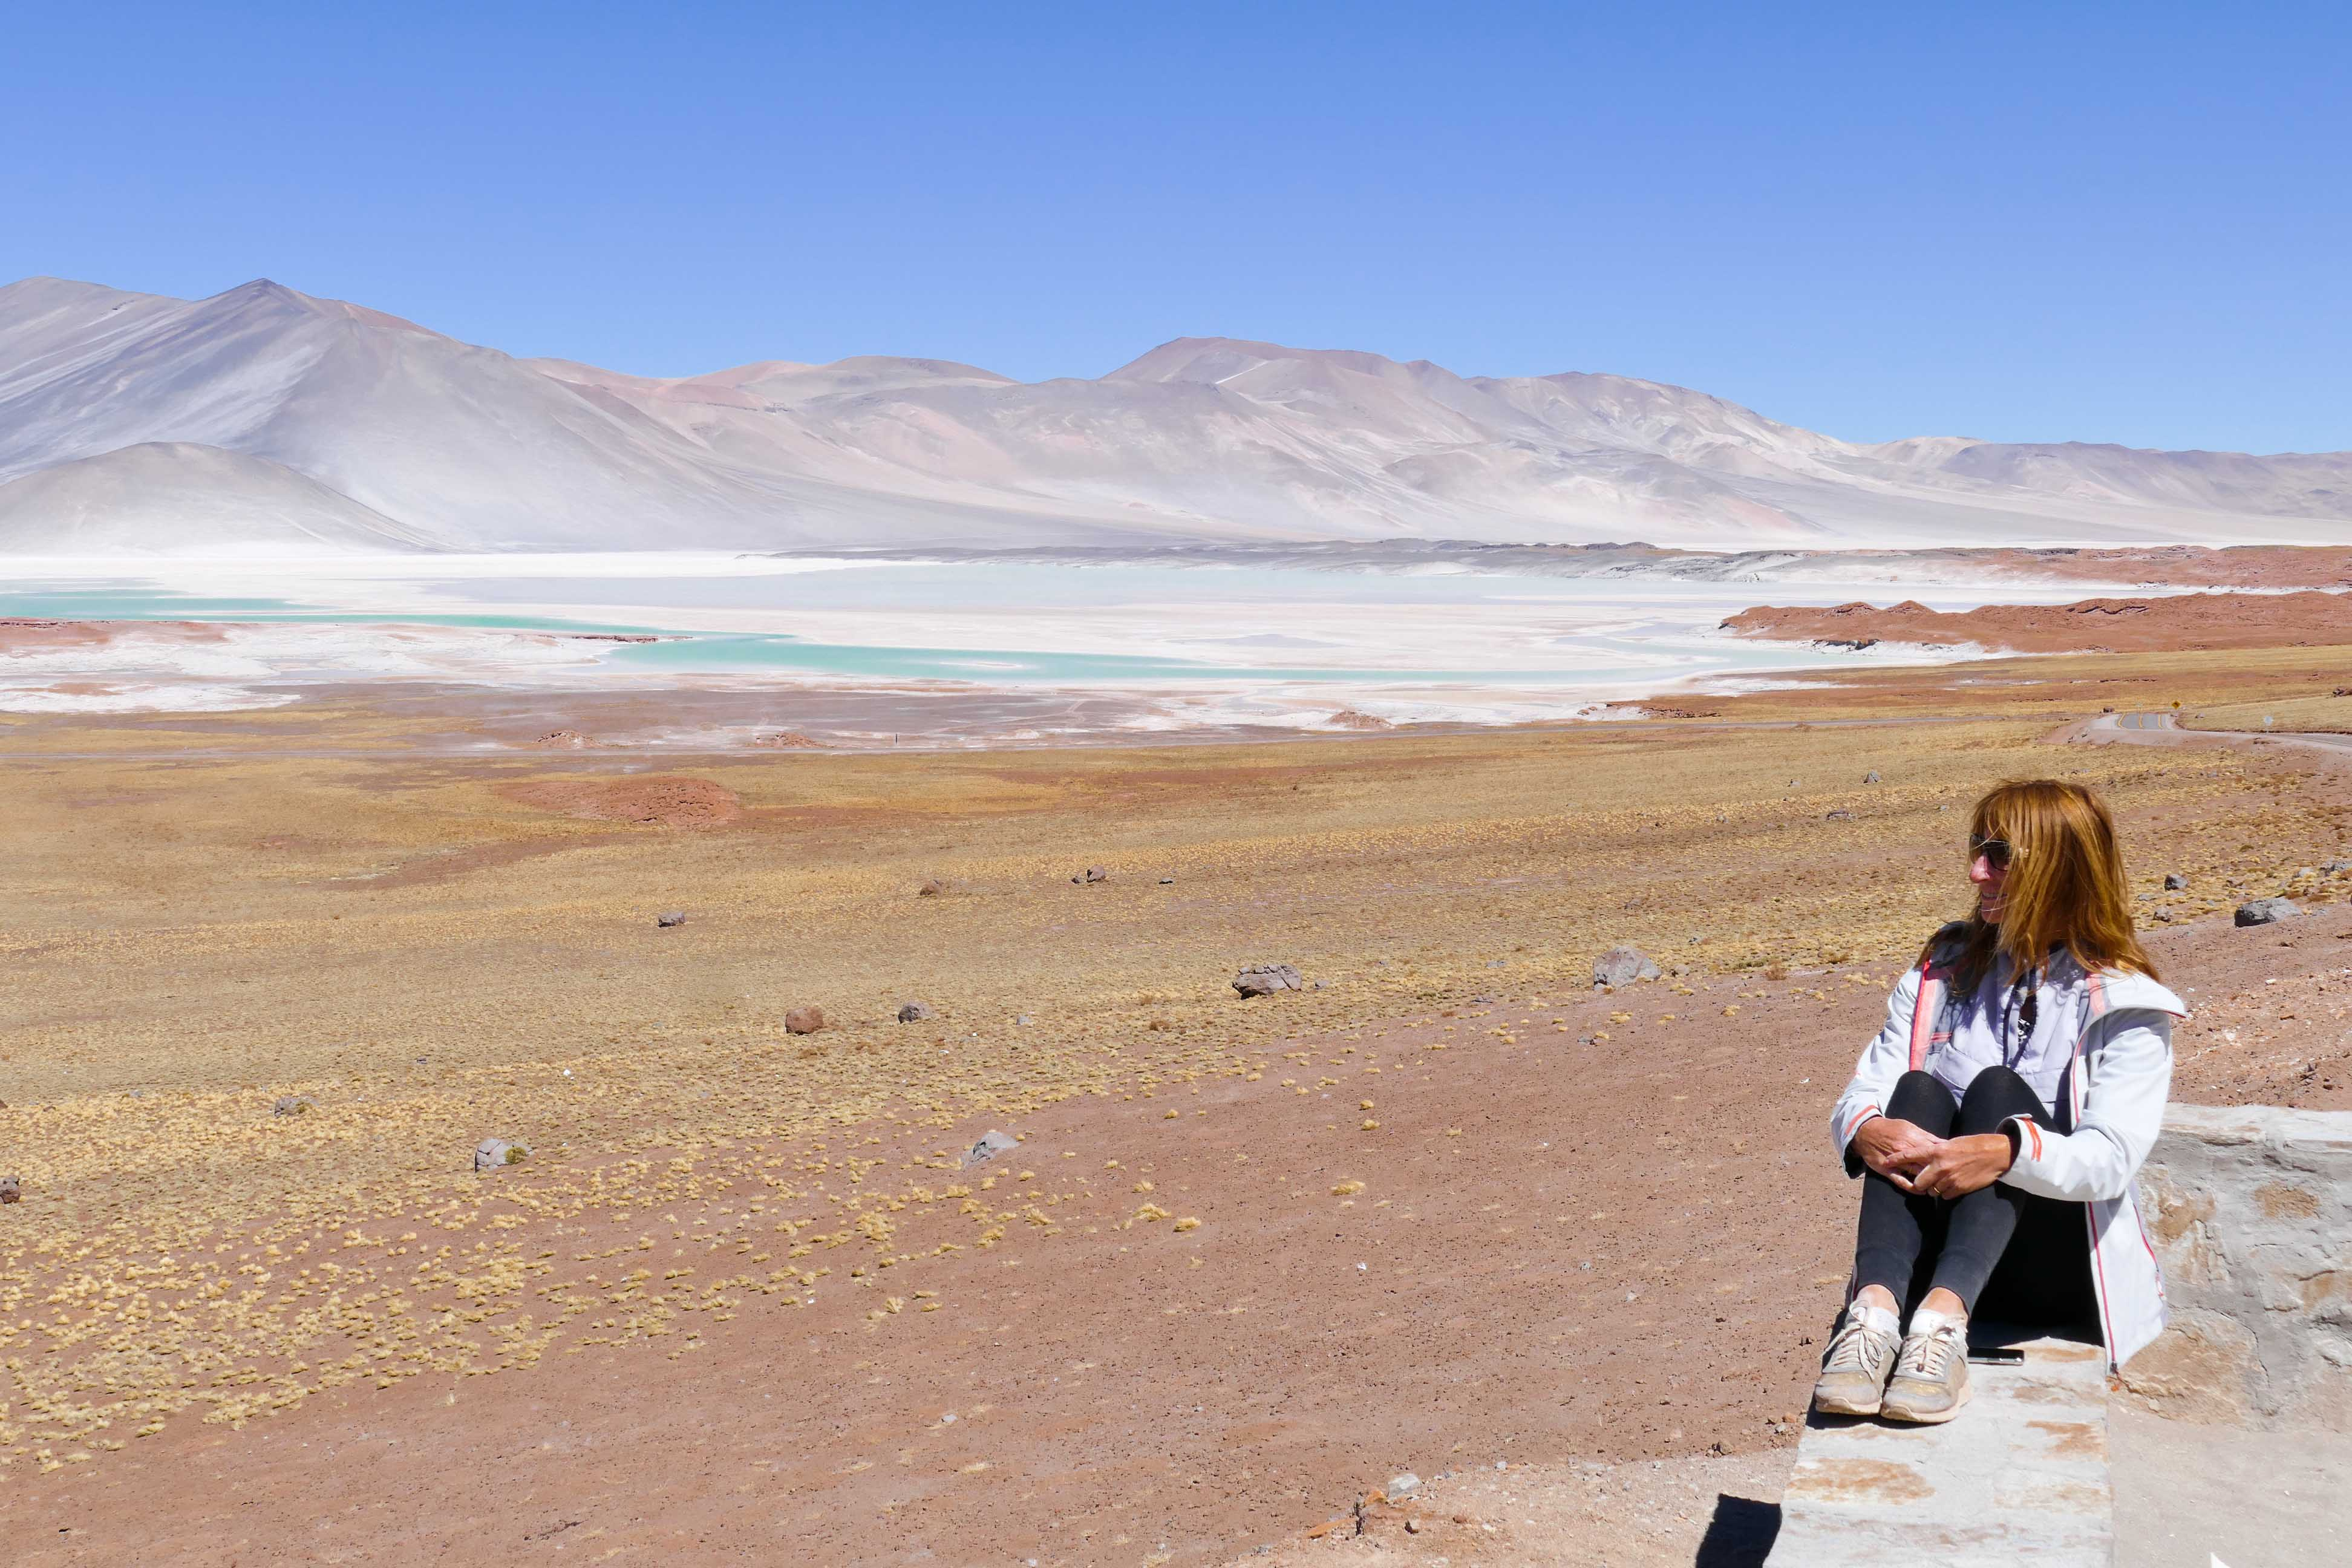 Désert d'Atacama - Lagunes du Salar et Geyser du Tatio